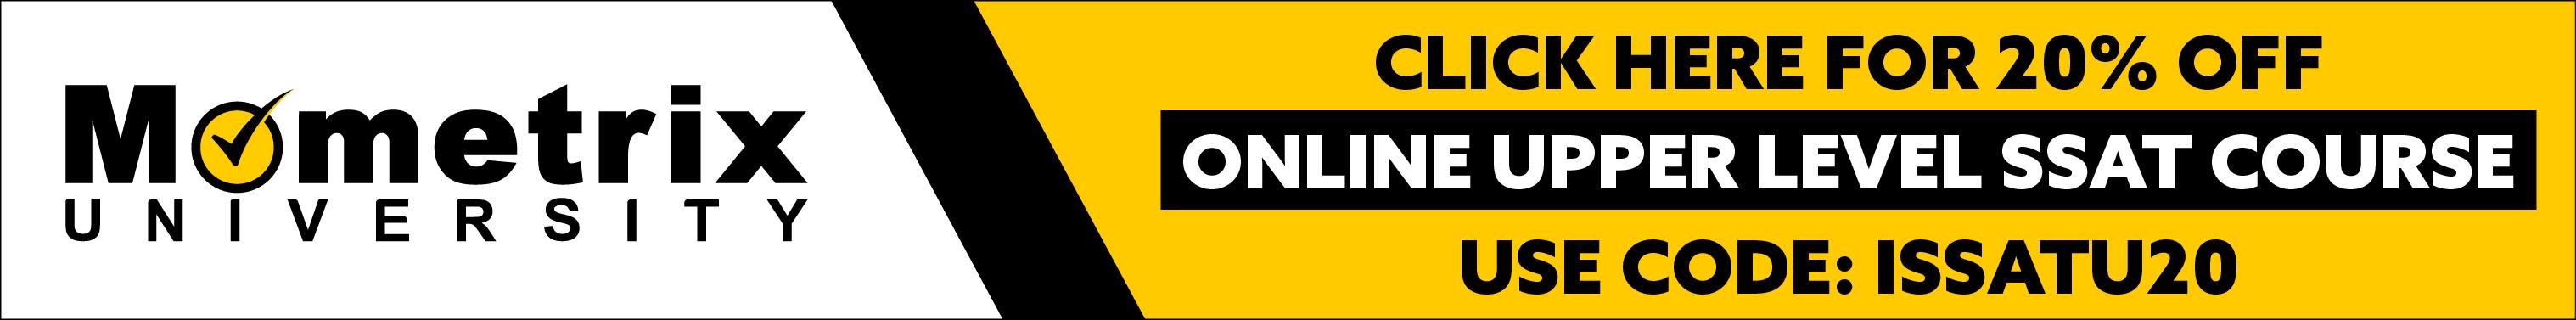 Mometrix University Ad for 20% off Online Upper Level SSAT Course